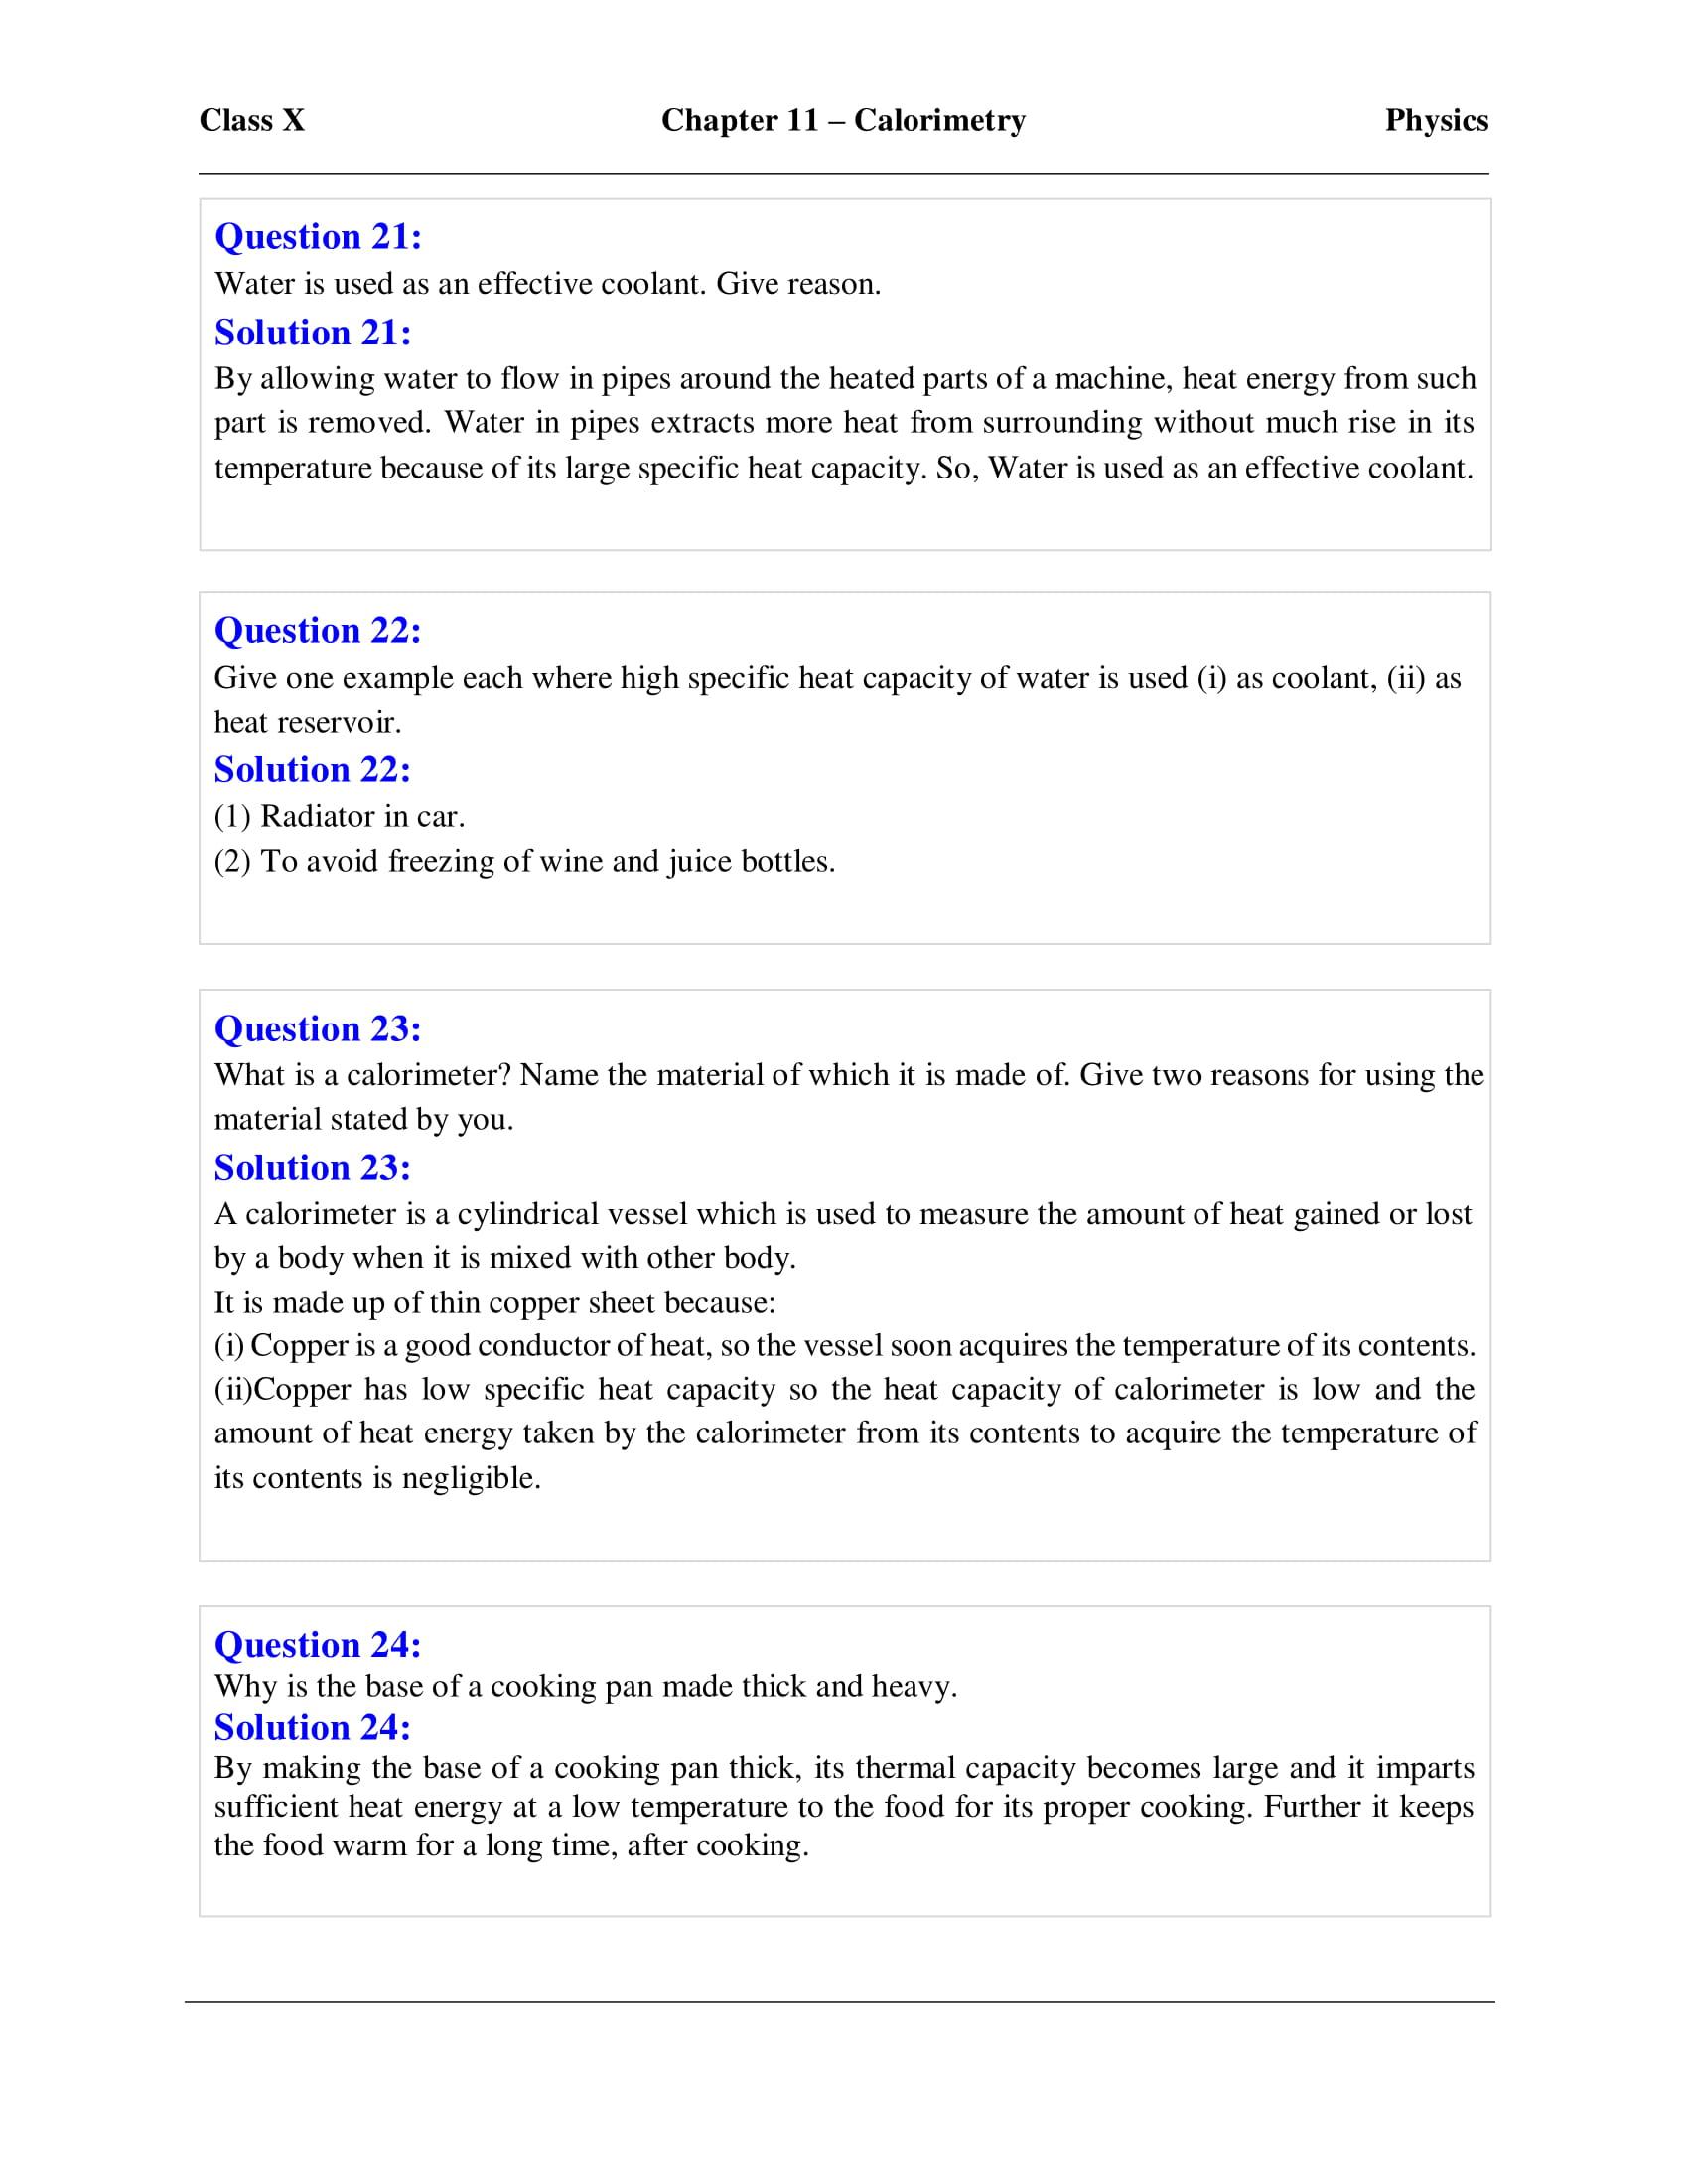 icse-selina-physics-solutions-class-10-chapter-11-calorimetry-06